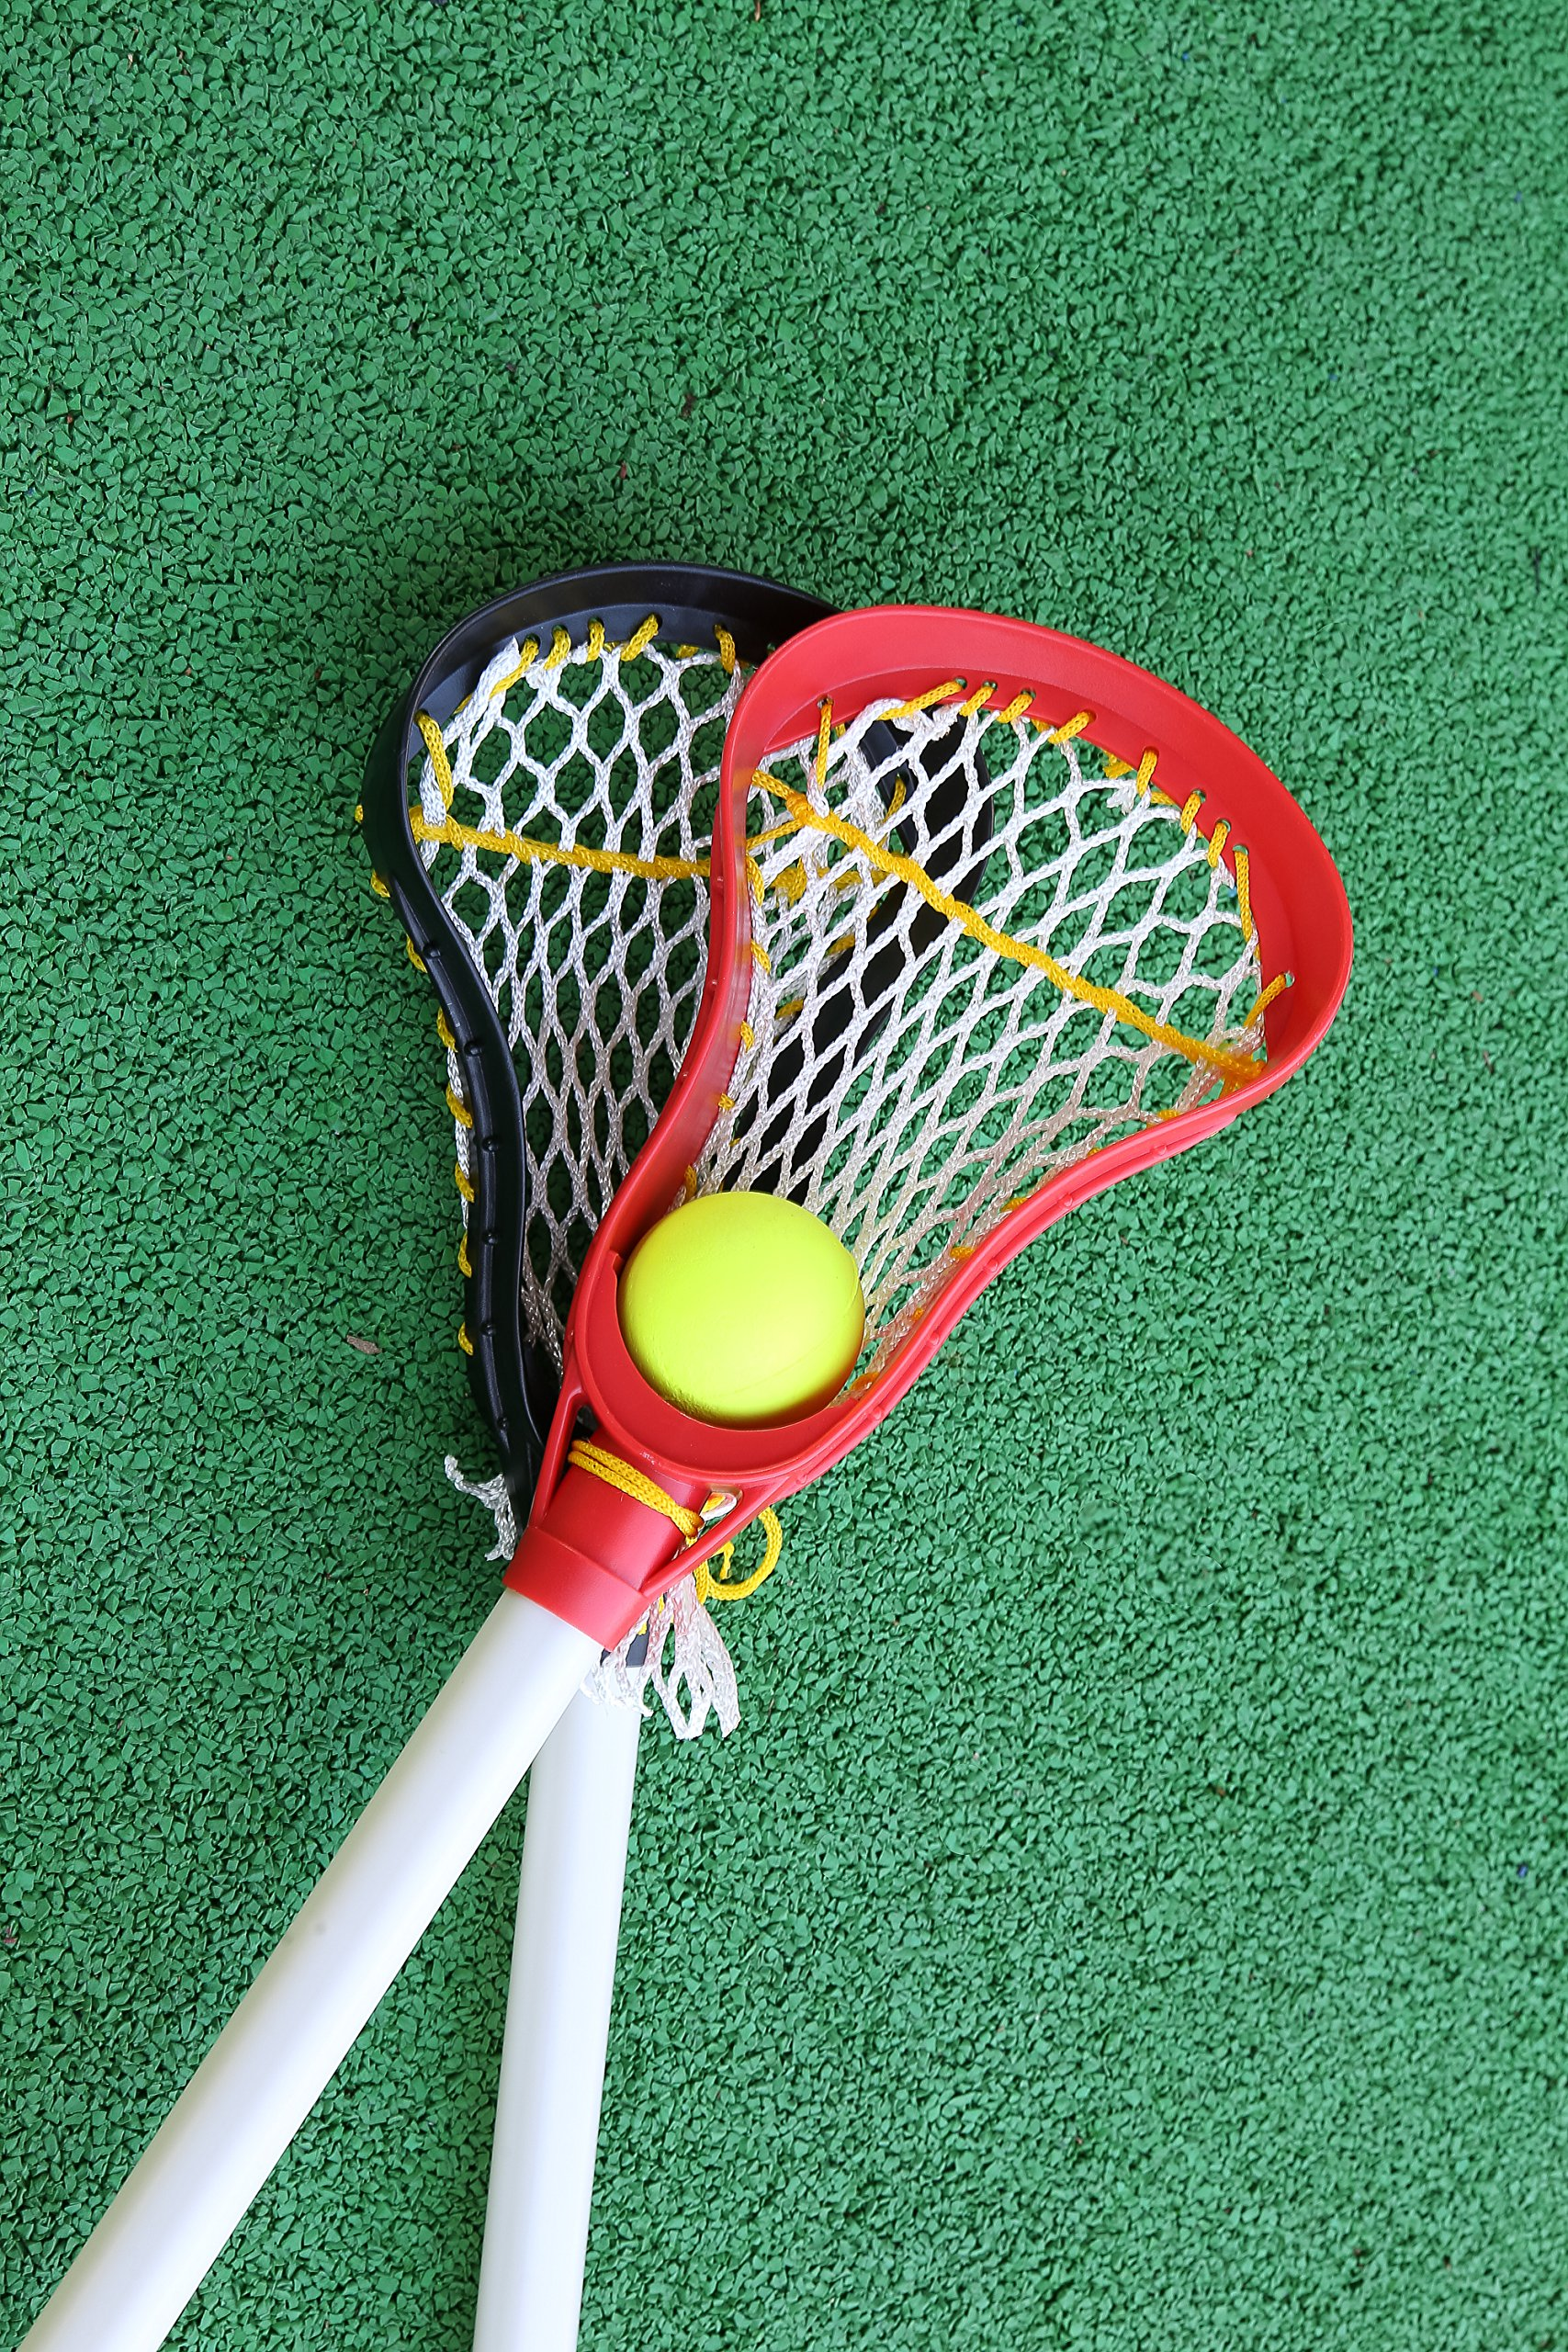 Kids Lacrosse Sticks - 2 Sticks (30 Inches) & 1 Ball - Soft Mesh Pockets, Durable Plastic Handles, & Large Head Design by Junior Lacrosse (Image #3)